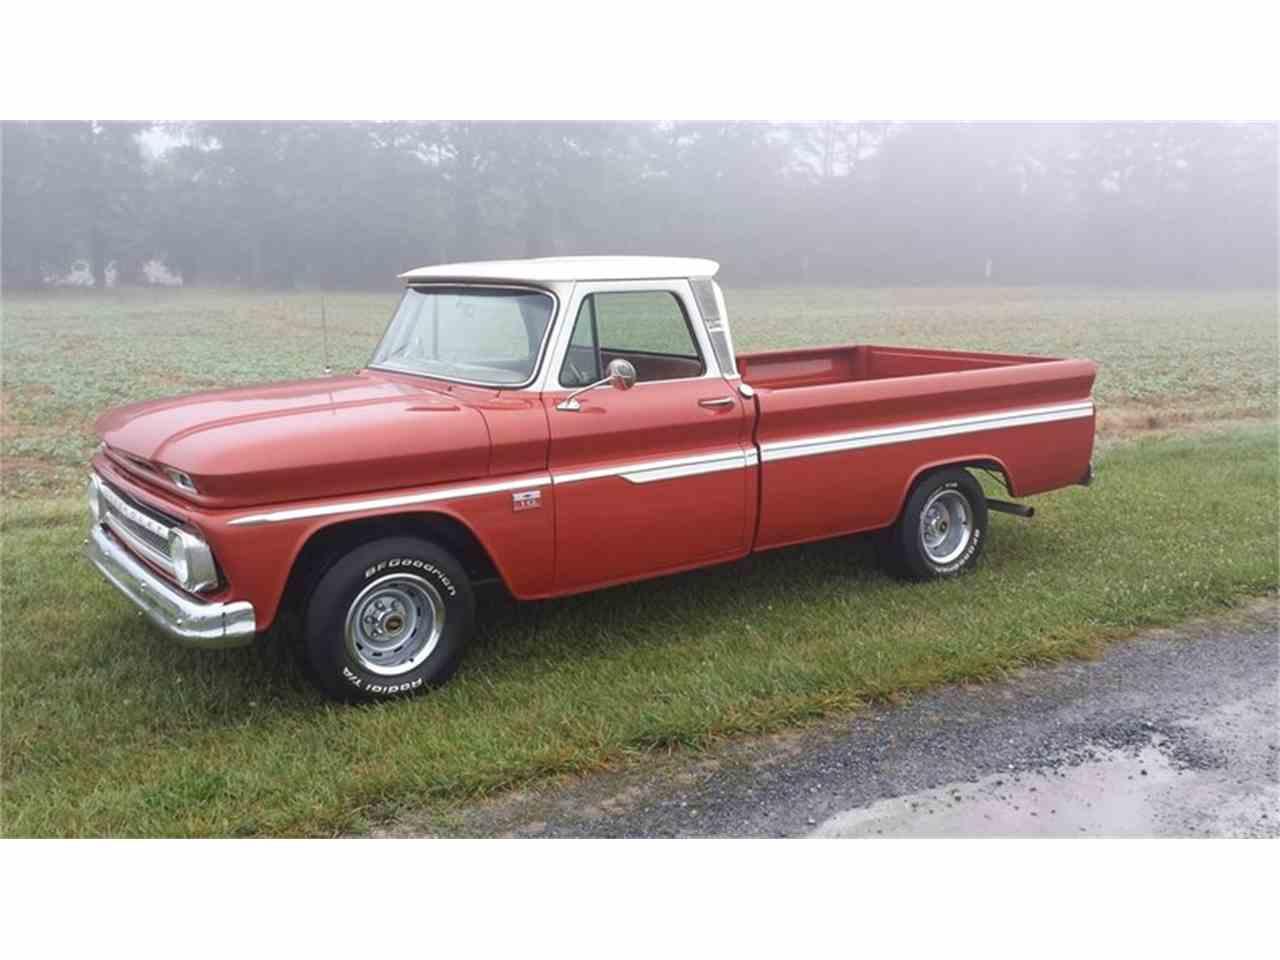 1966 chevrolet c10 1 2 ton pickup for sale cc 1035618. Black Bedroom Furniture Sets. Home Design Ideas